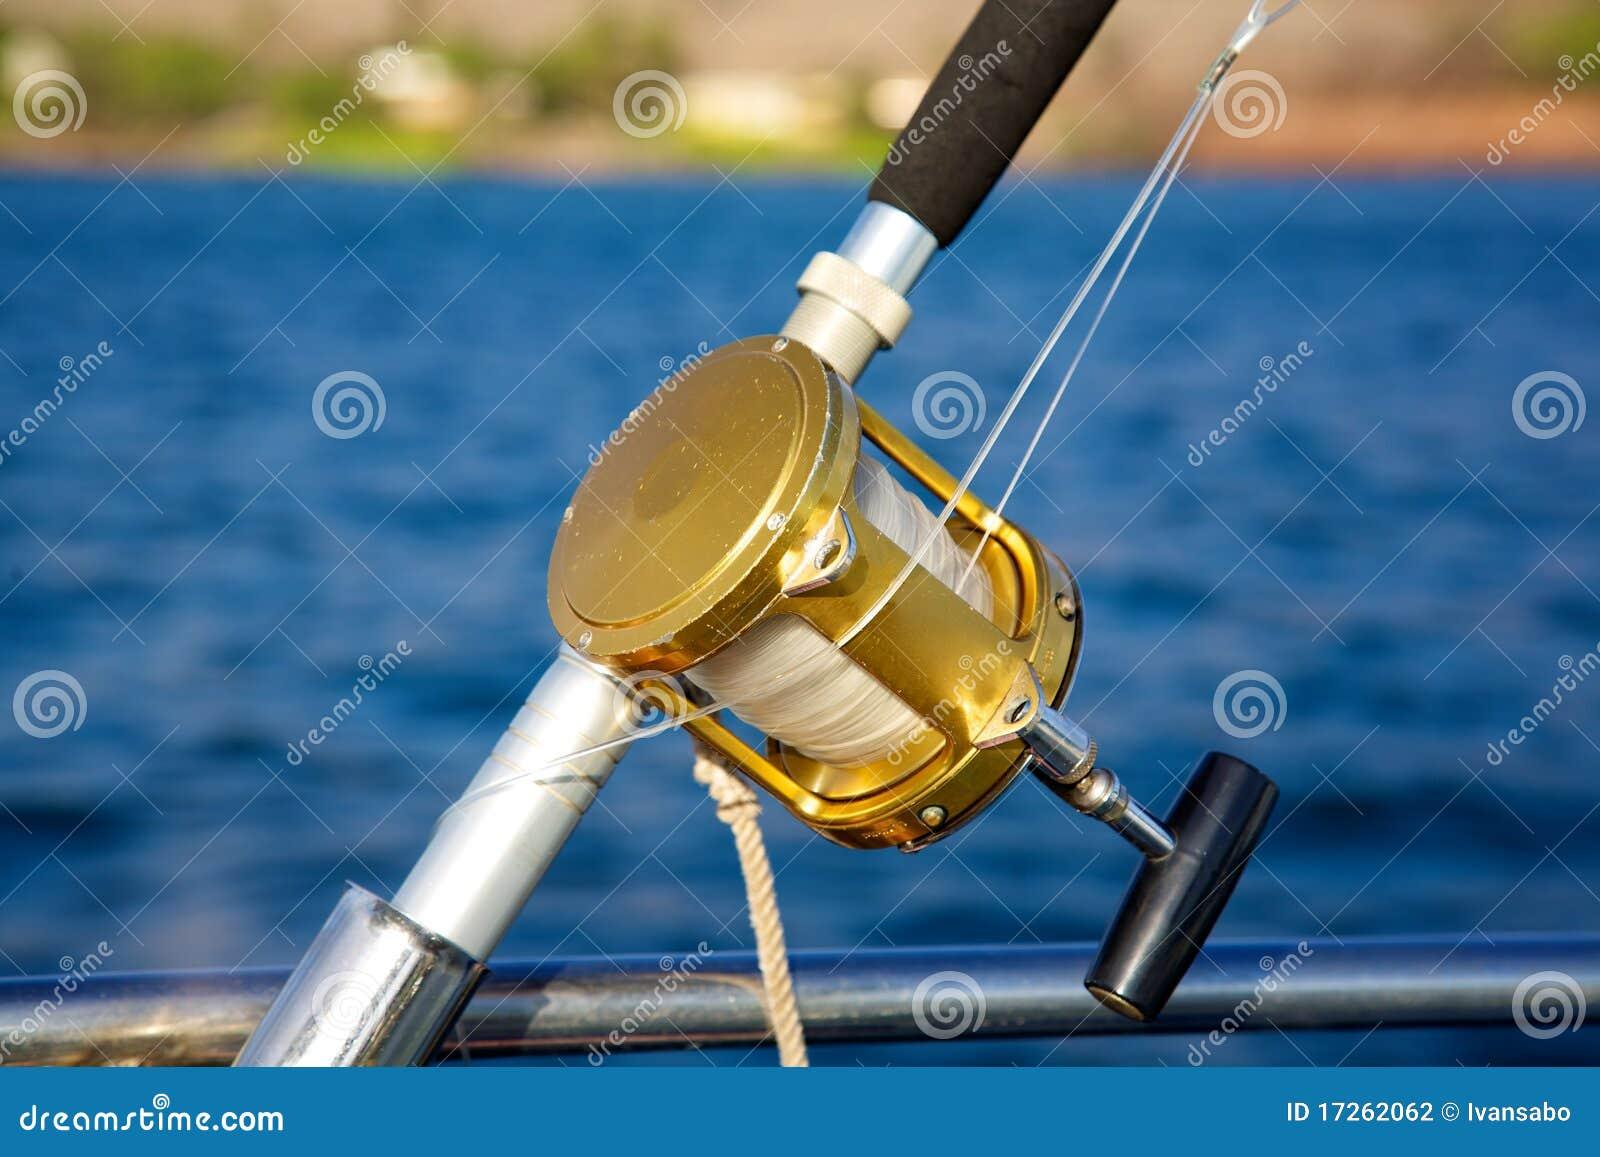 A deep sea fishing rod and reel stock photography image for Deep sea fishing rod and reel